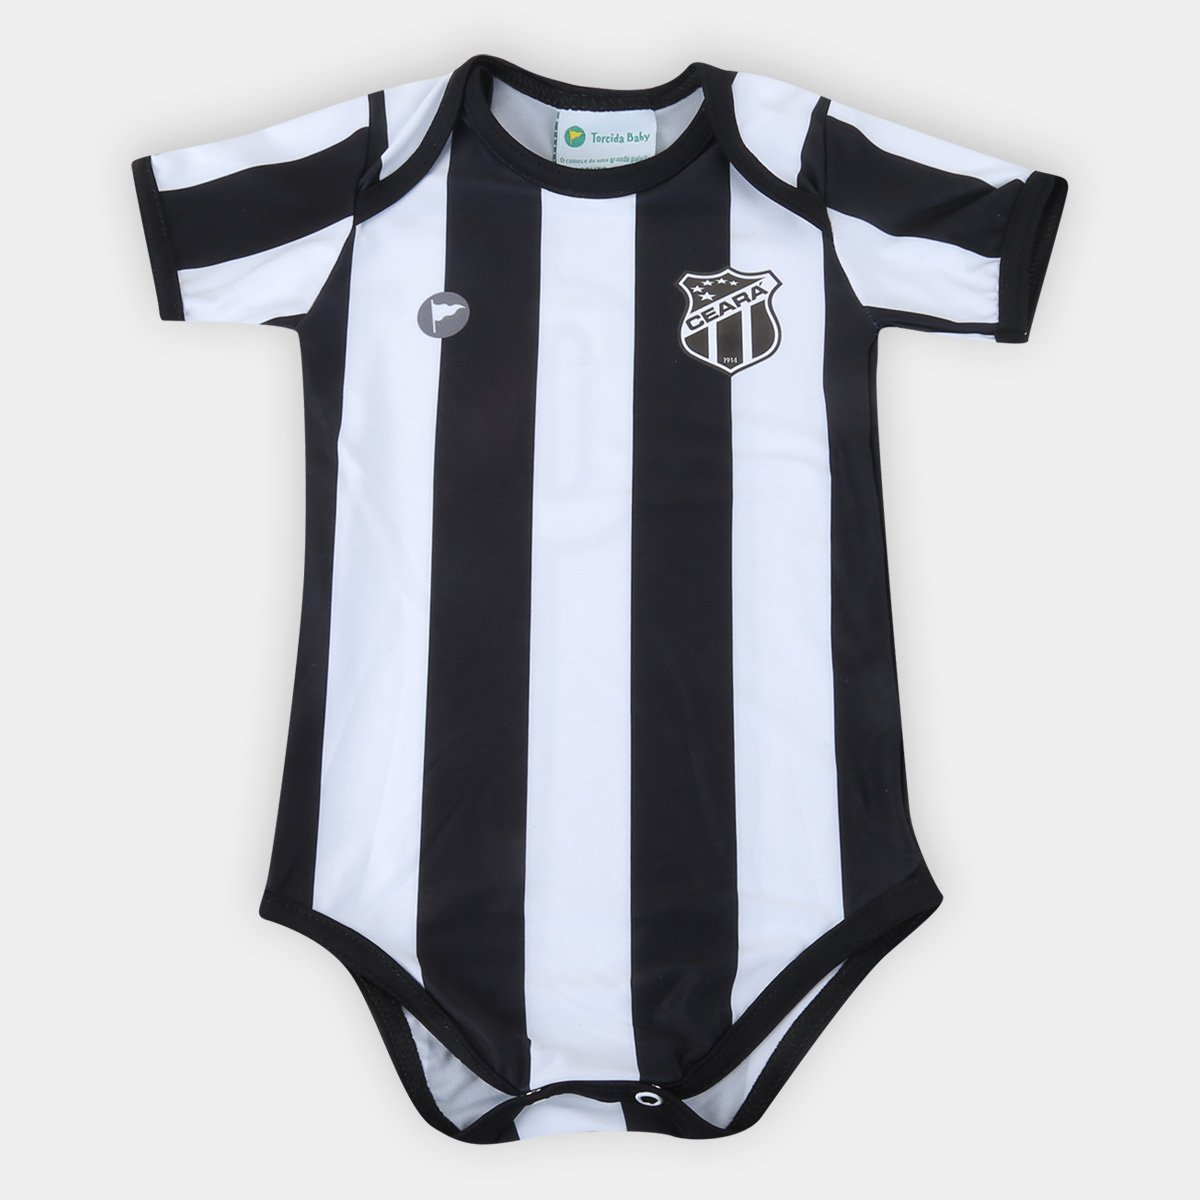 Body Ceará Infantil Torcida Baby Listrado Proteção UV